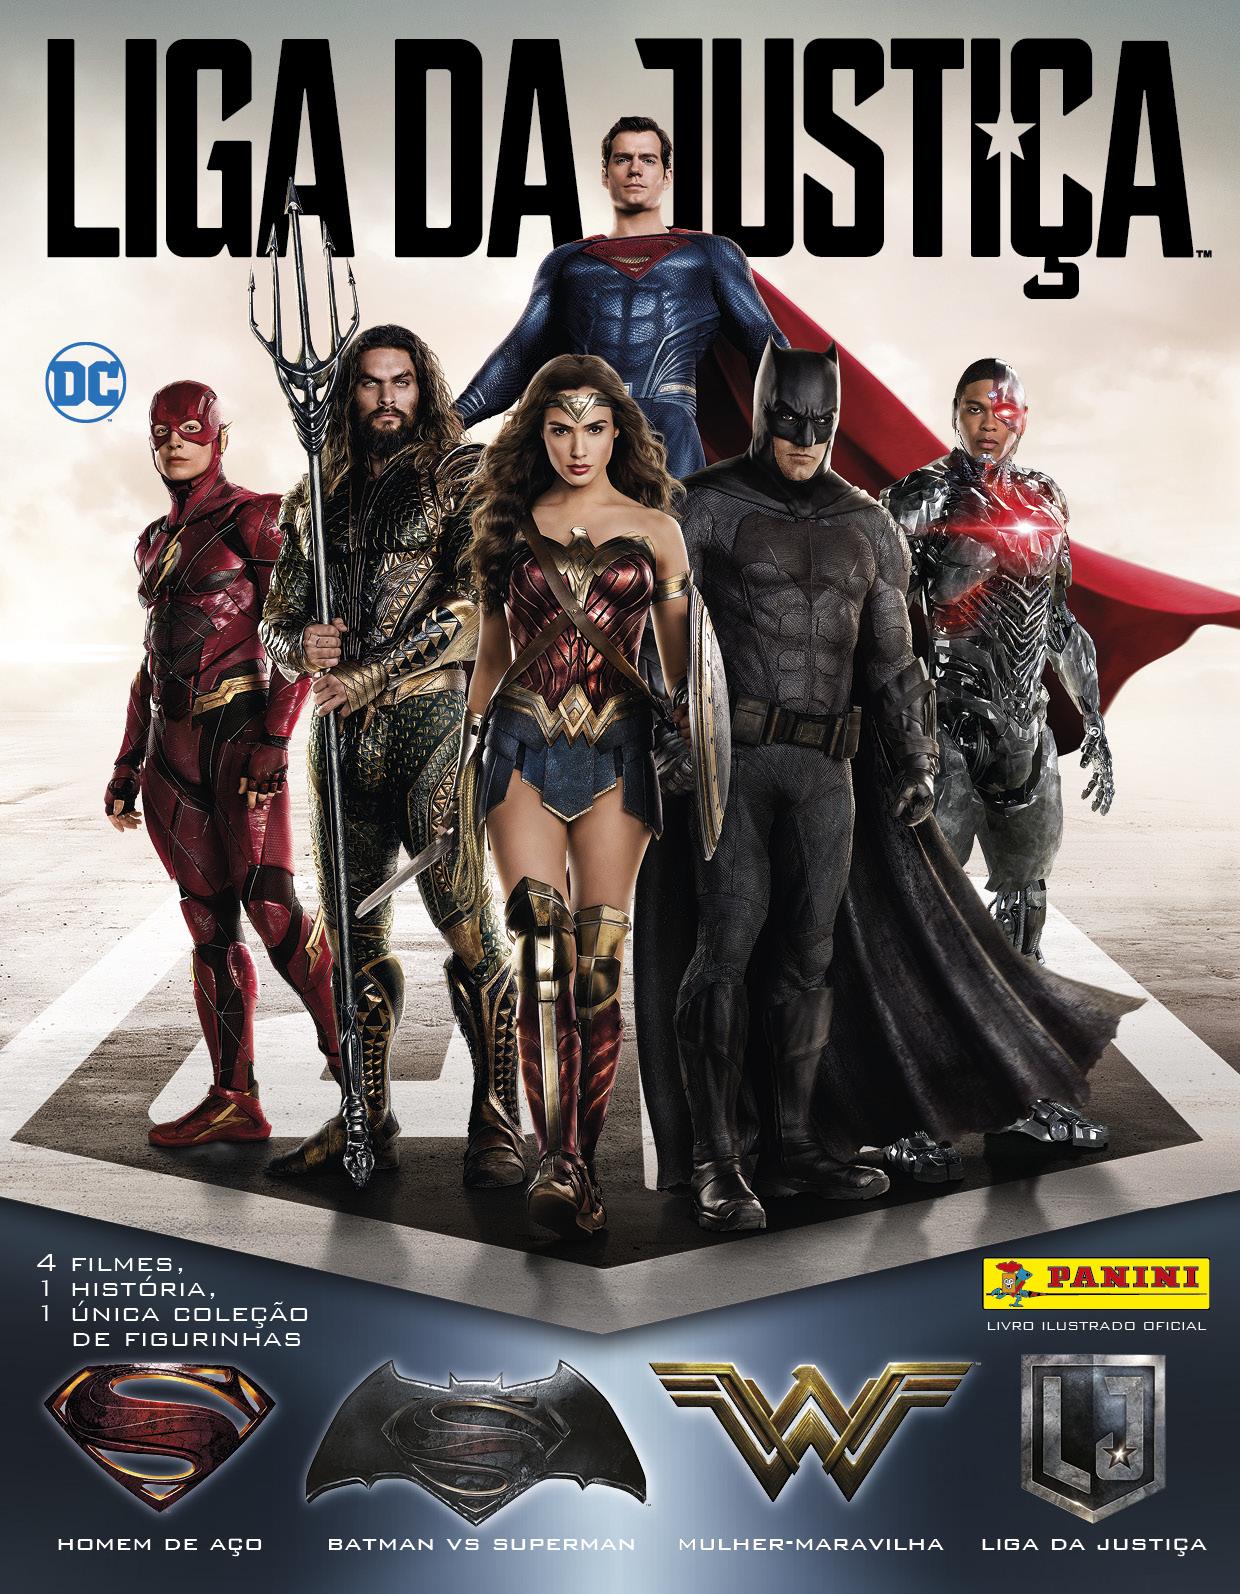 1a_Capa_Justice_League_Movie_CORTESIA_bx